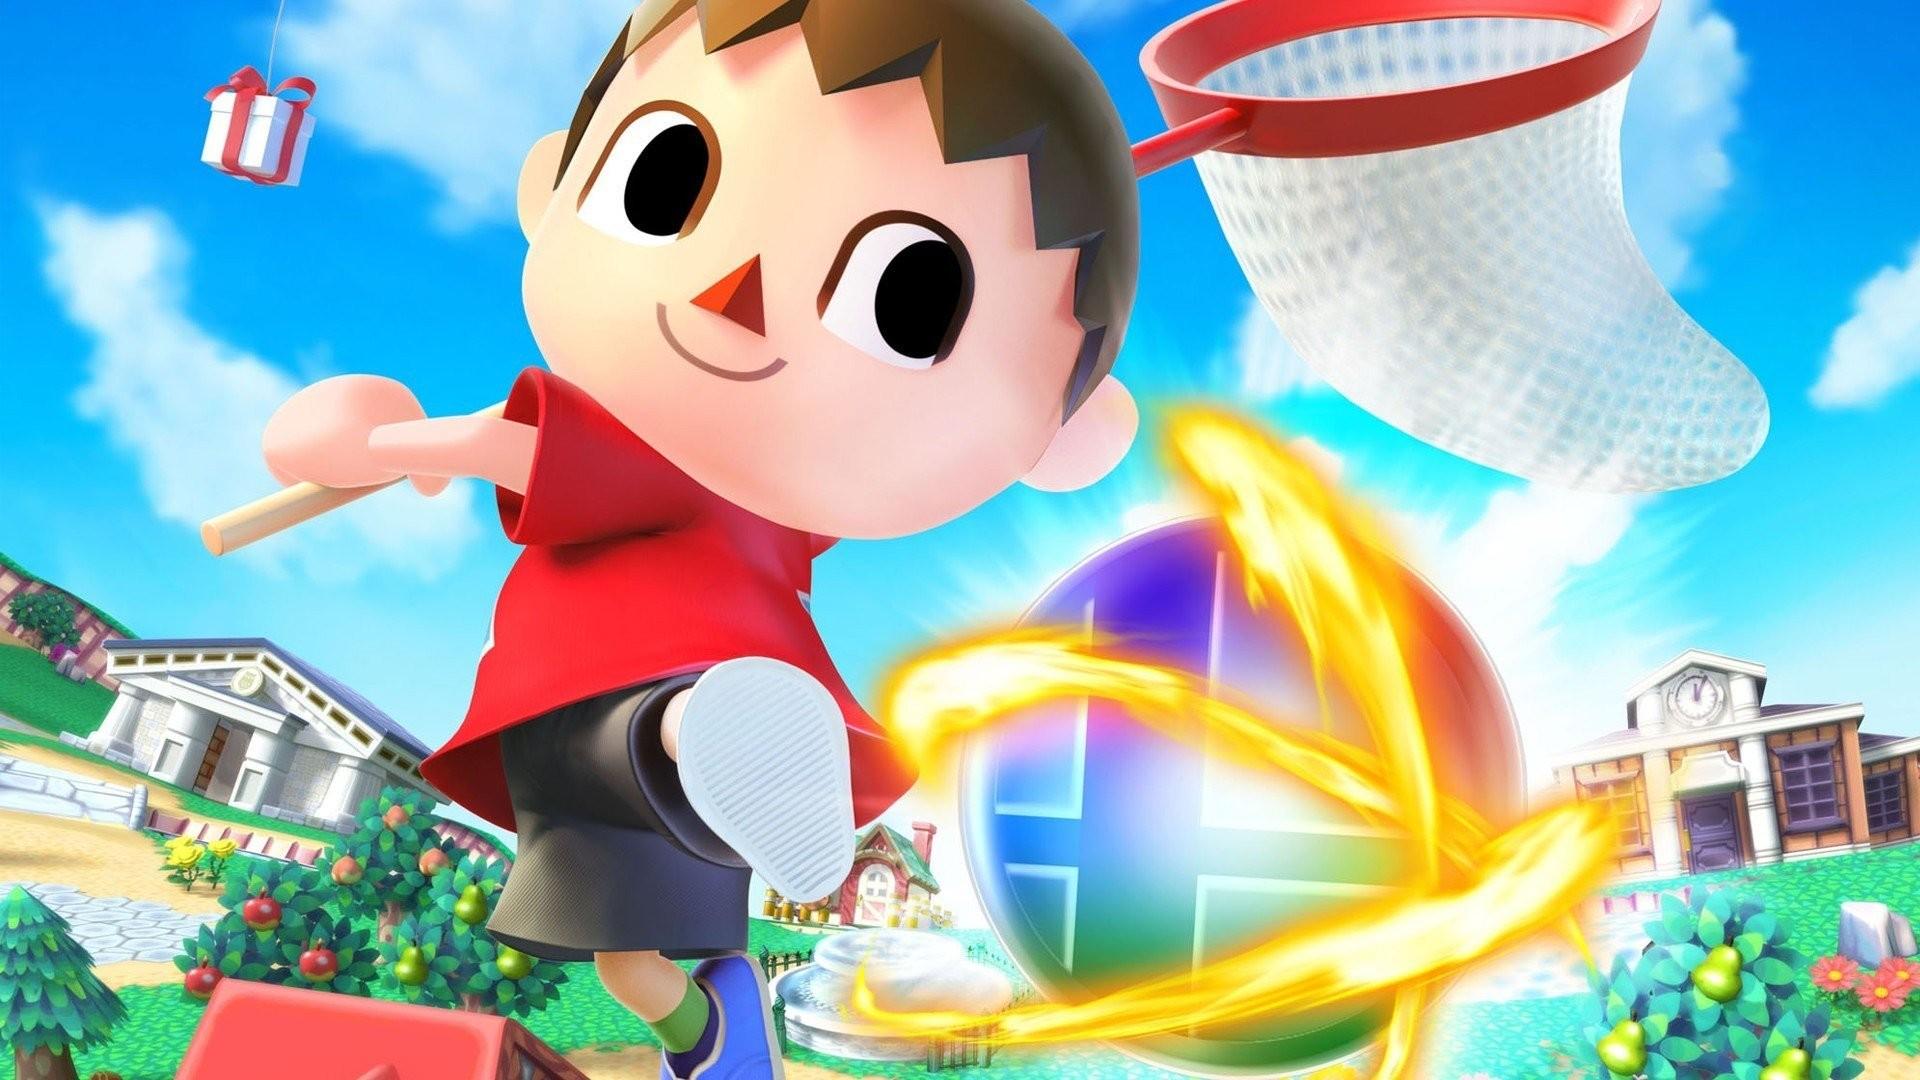 Villager Smash Bros